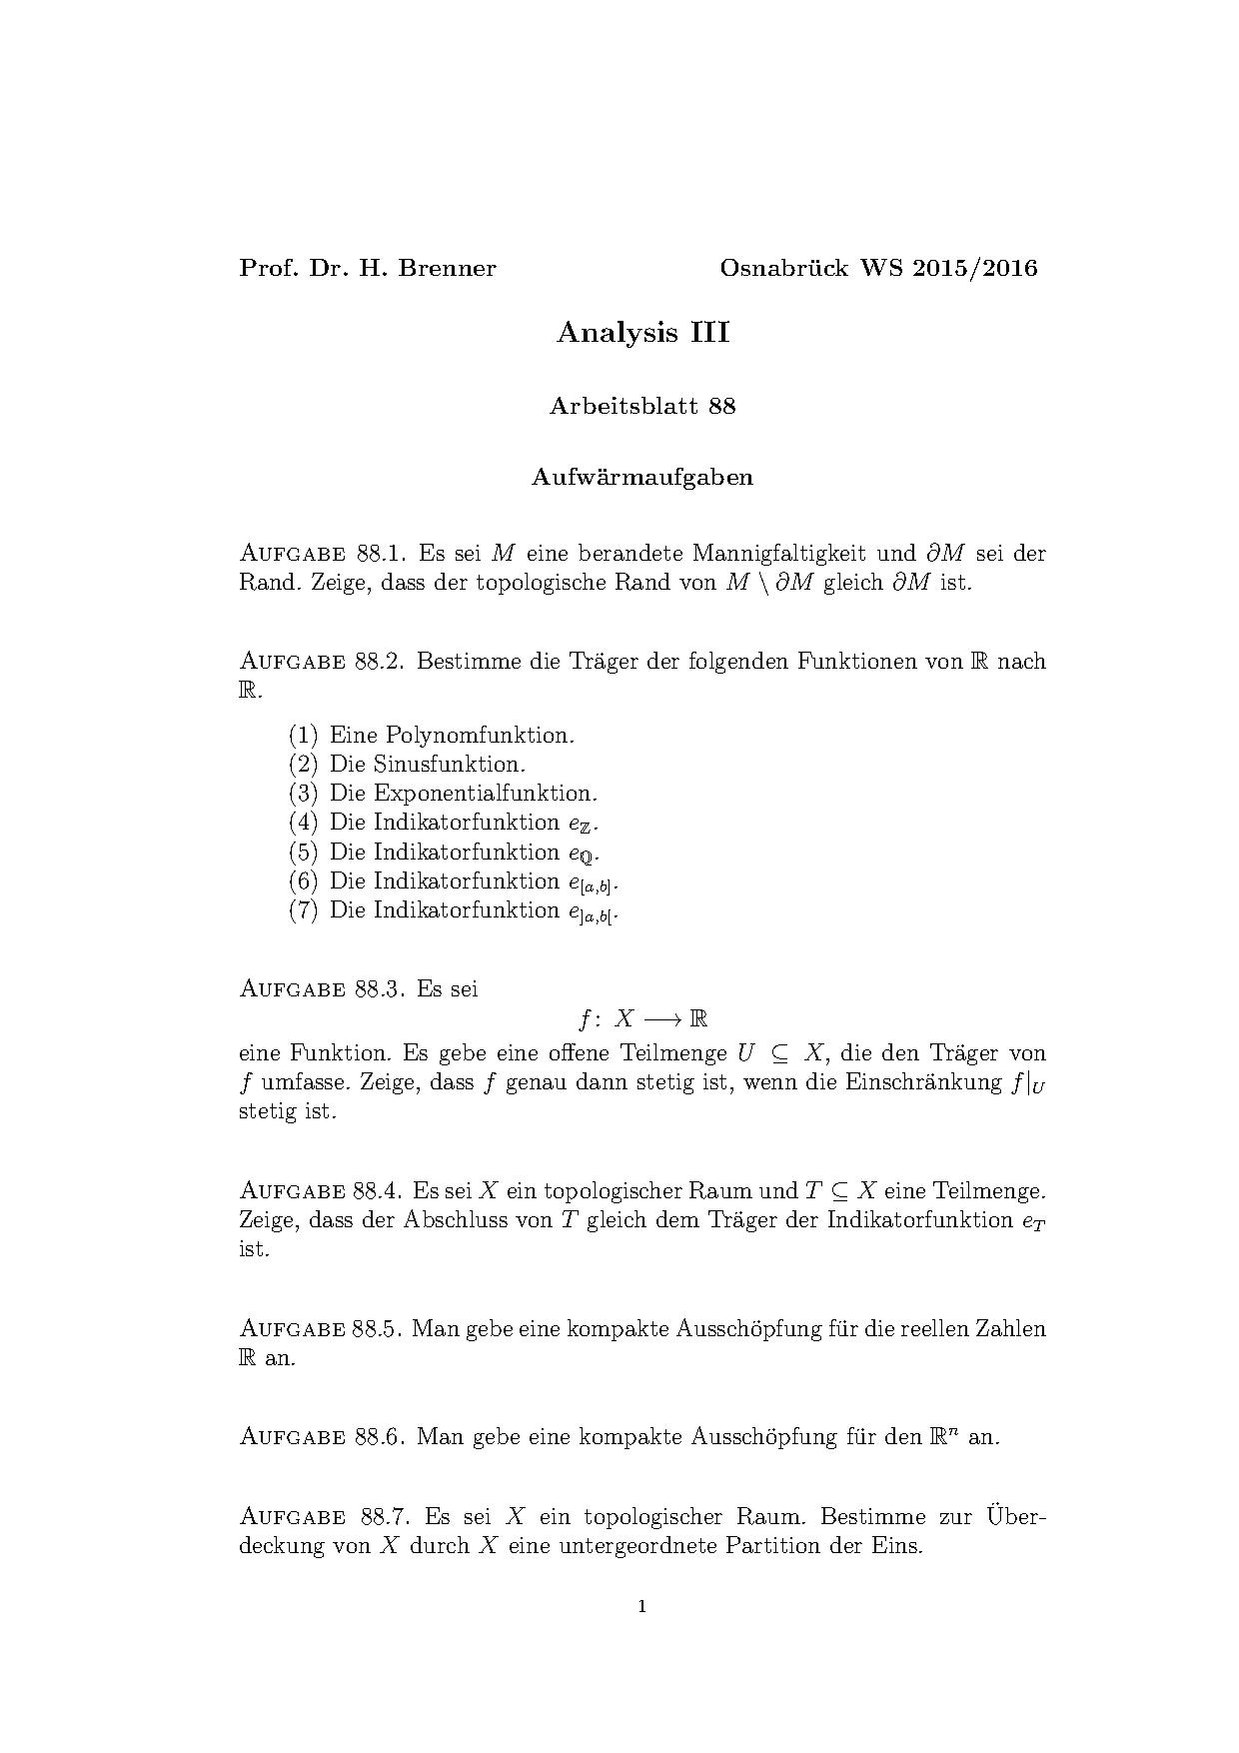 File:Analysis (Osnabrück 2014-2016)Teil IIIArbeitsblatt88.pdf ...